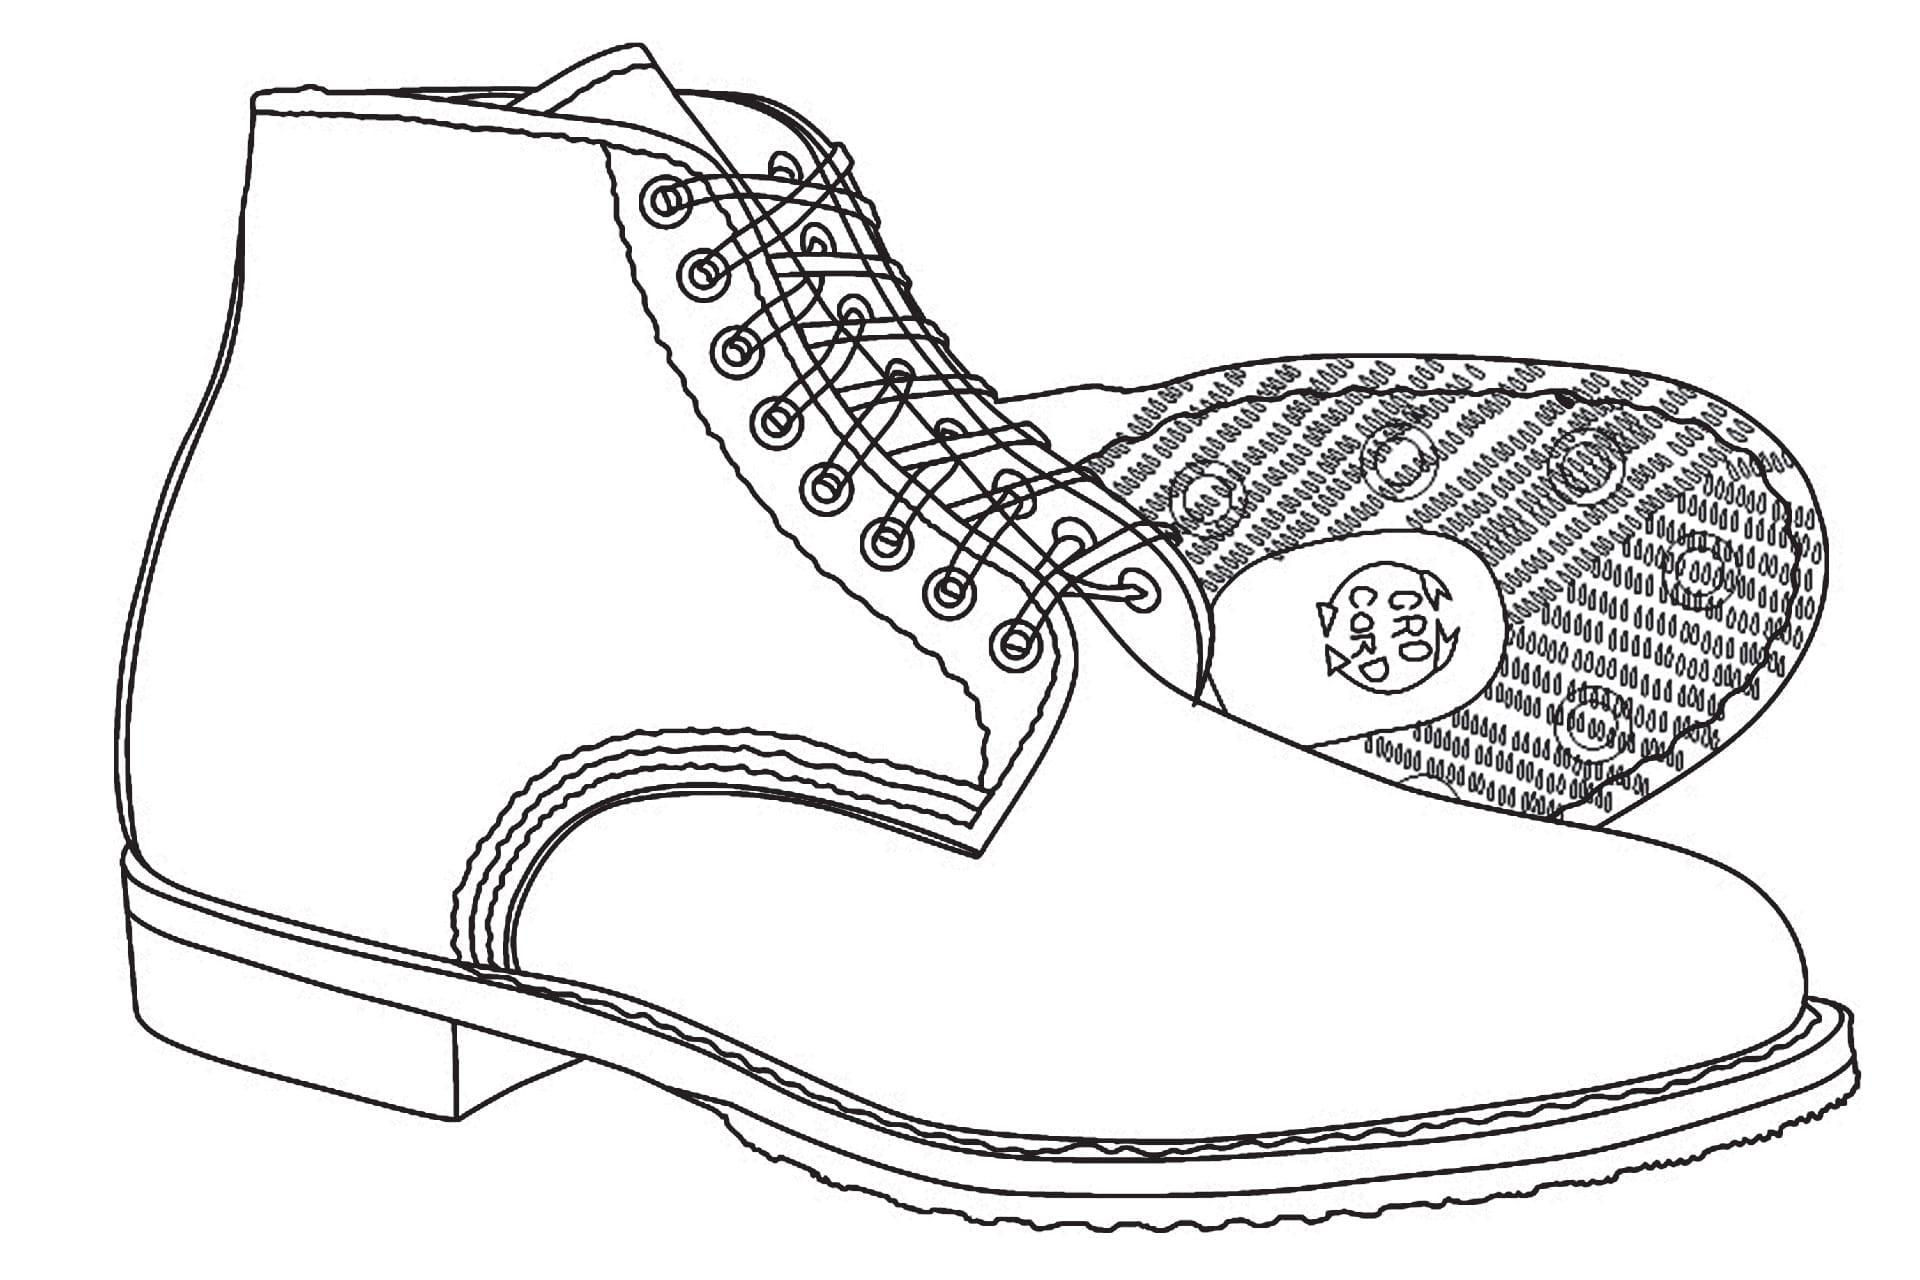 Sketch or Raster to Victor Design || Graphics Design Services ||